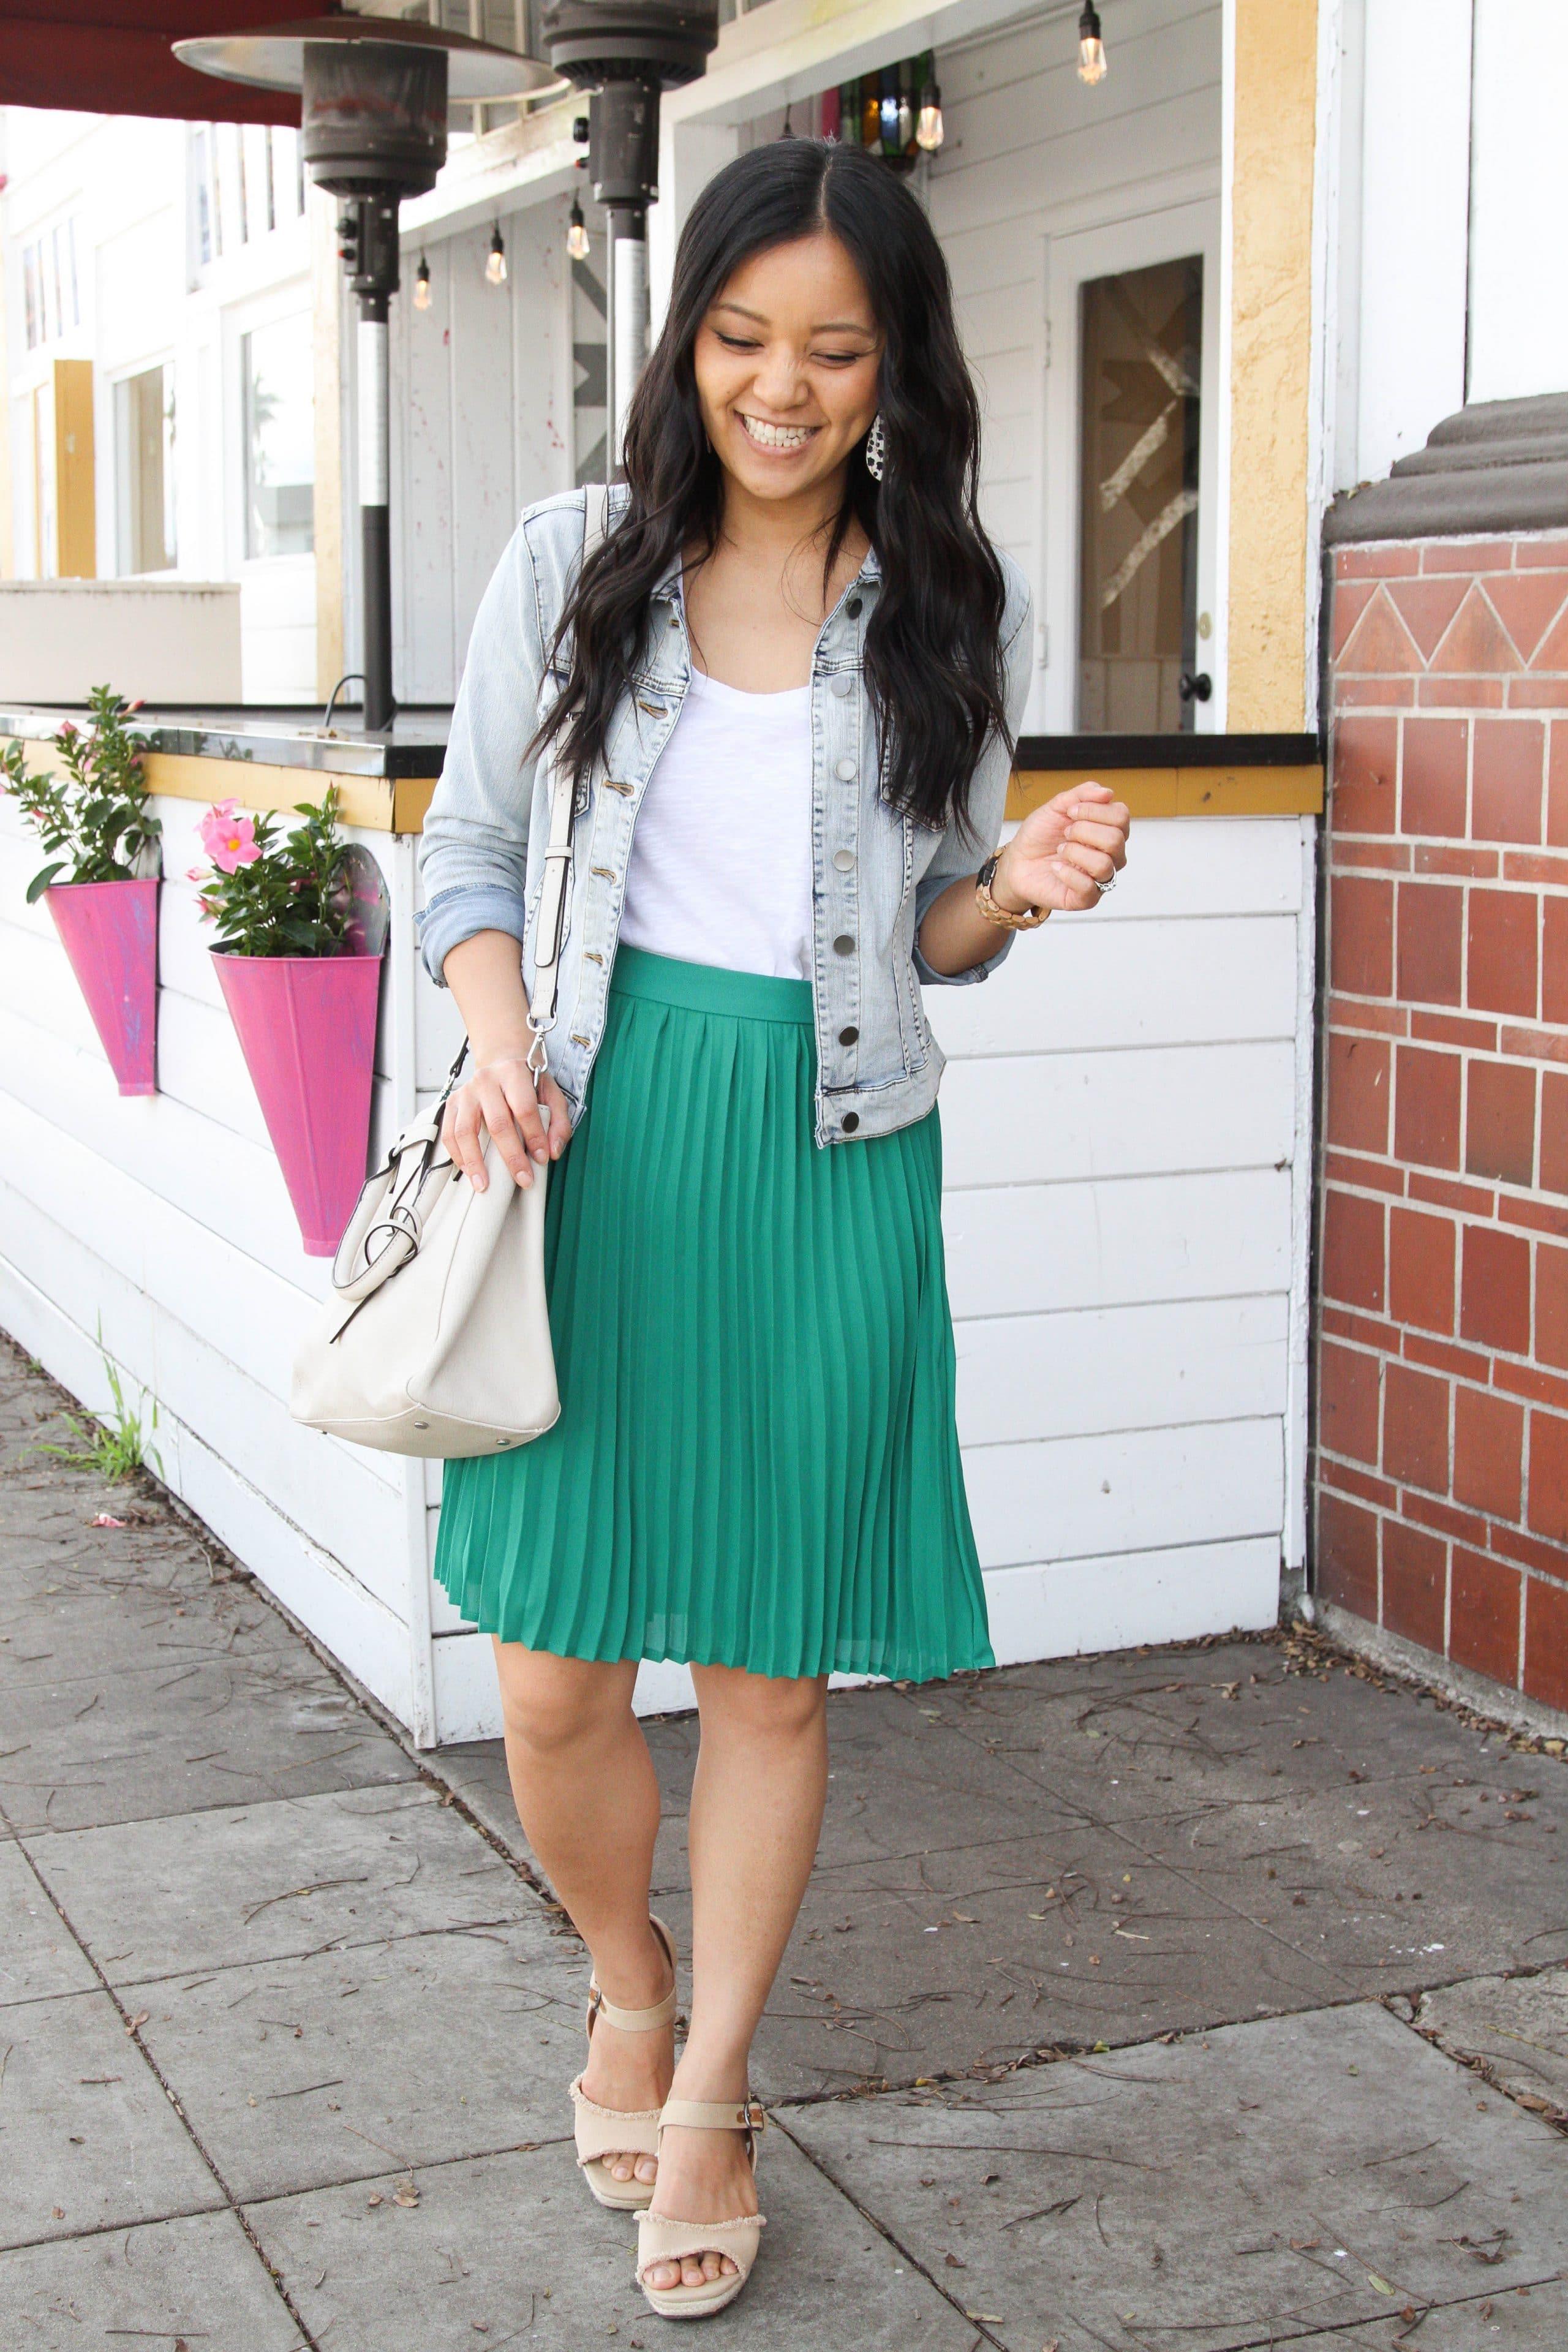 green skirt + white tee + denim jacket spring outfit